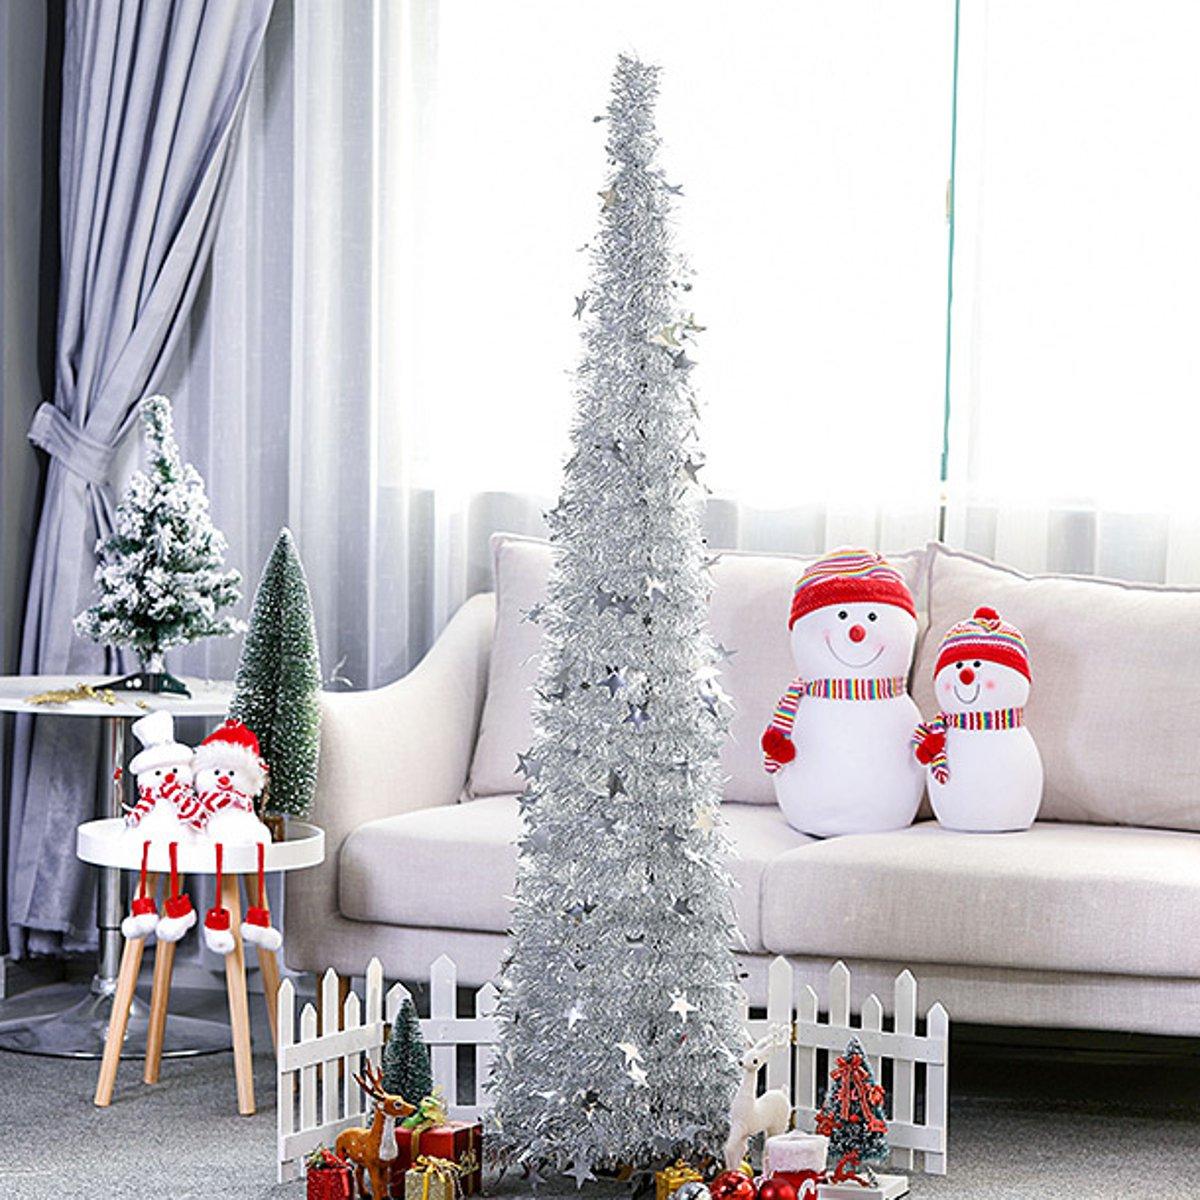 Aliexpress.com : Buy DIY 5ft/1.5M Tinsel Christmas Tree Foldable Retractable Indoor Outdoor Tree ...